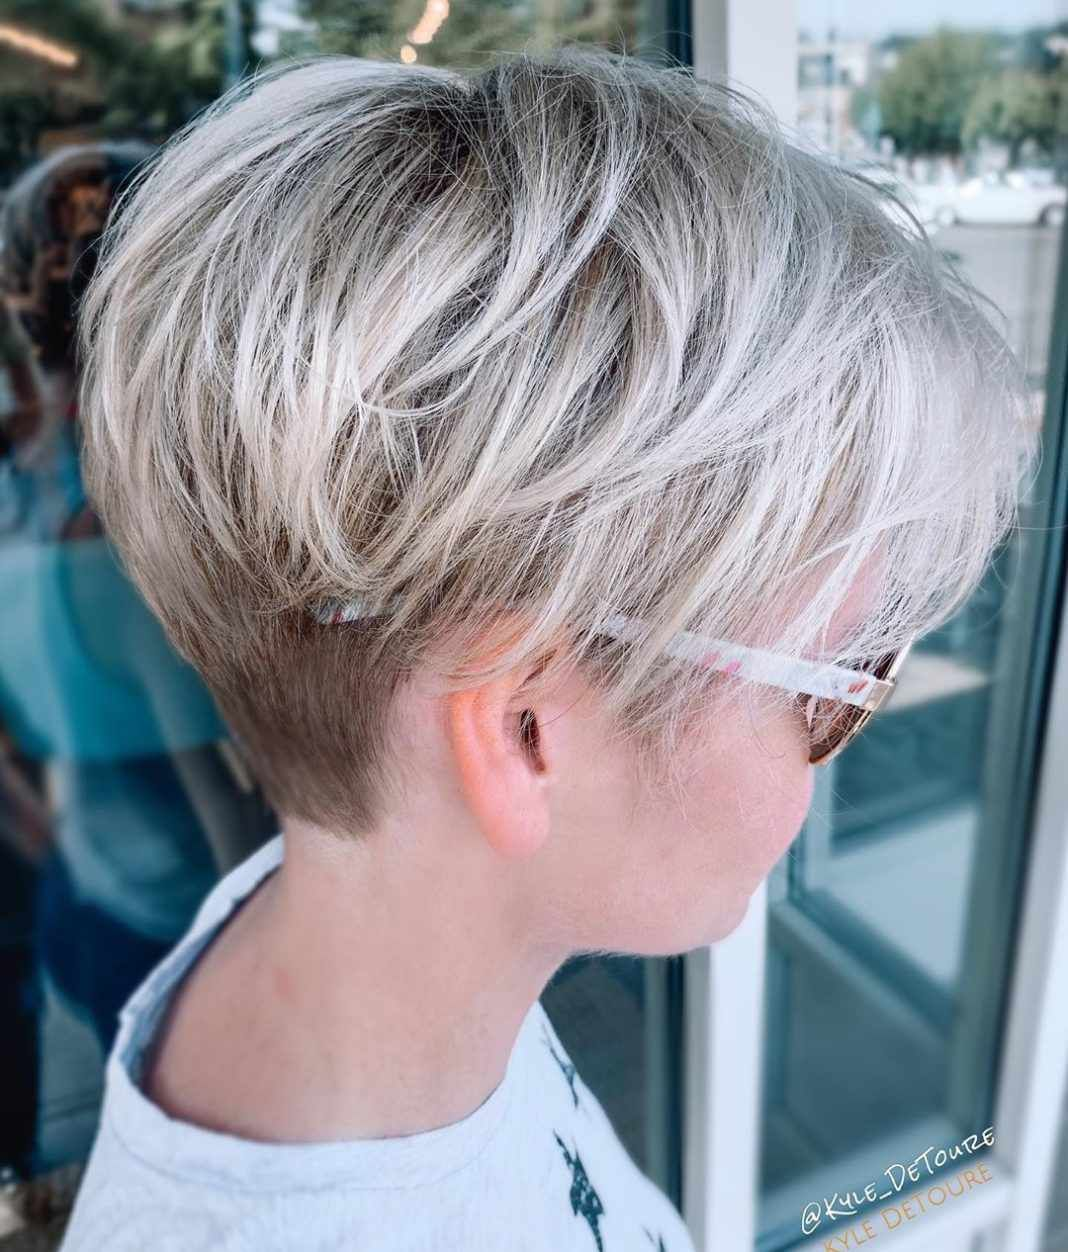 30+ Pinterest coiffure courte 2019 inspiration